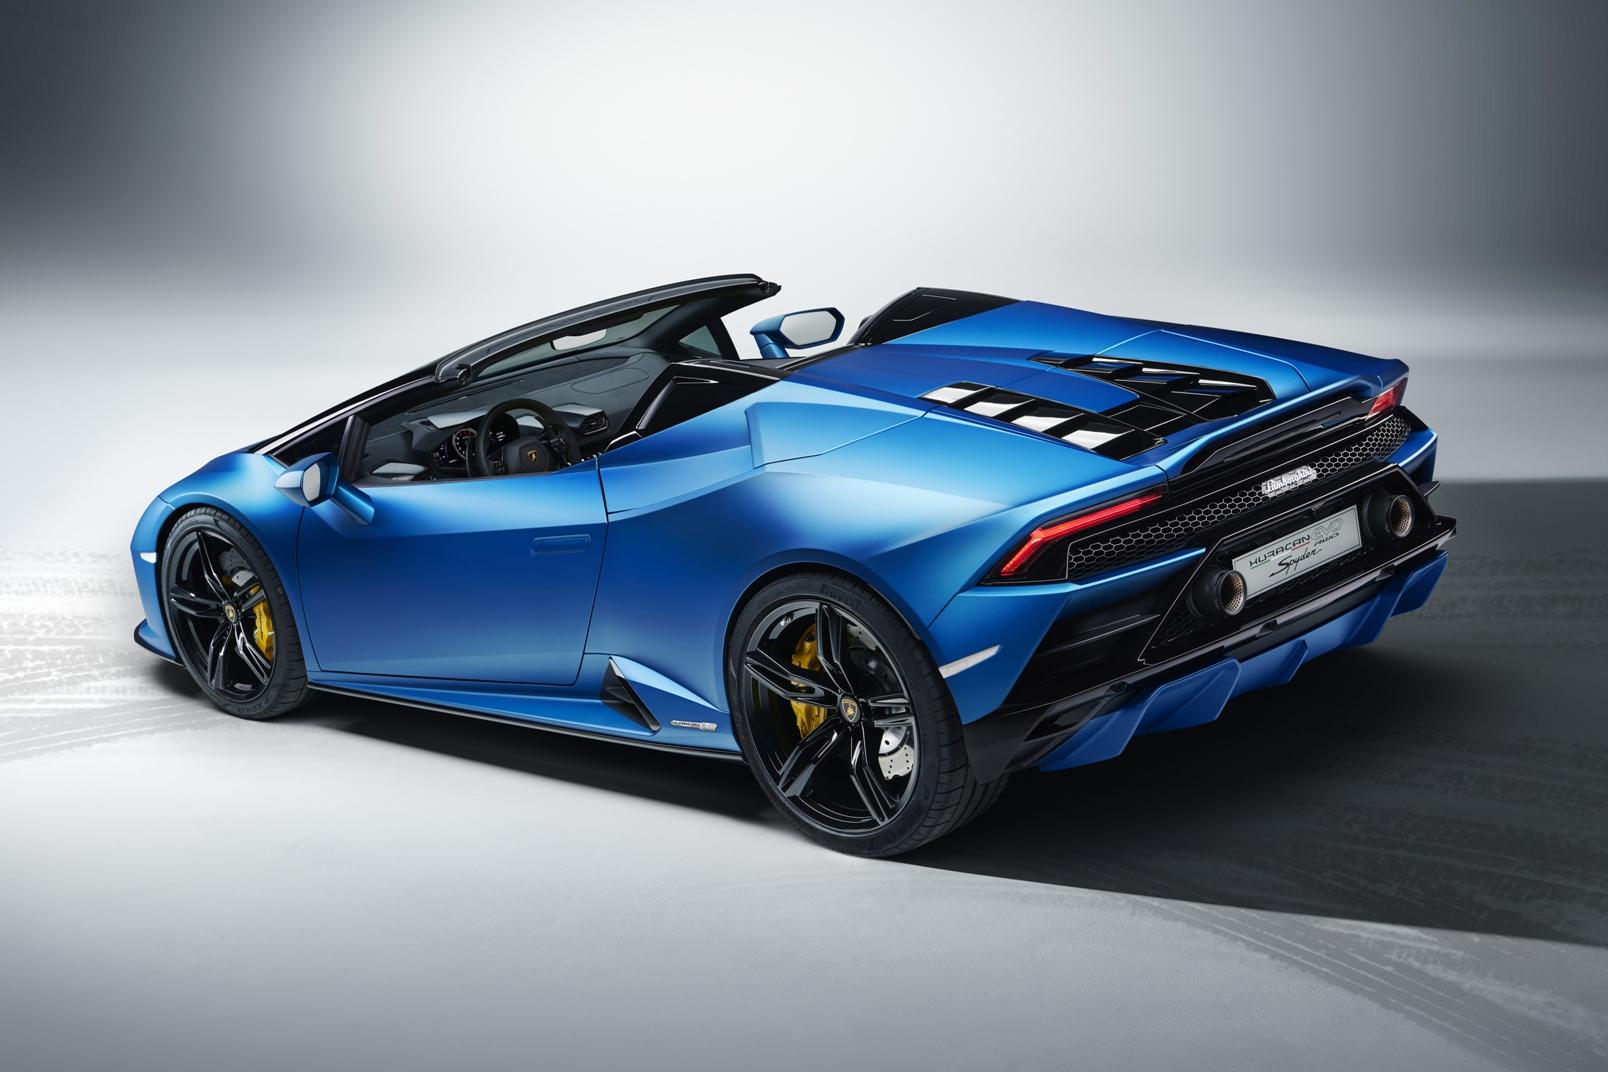 Lamborghini Huracán Evo Rwd Spyder (6)